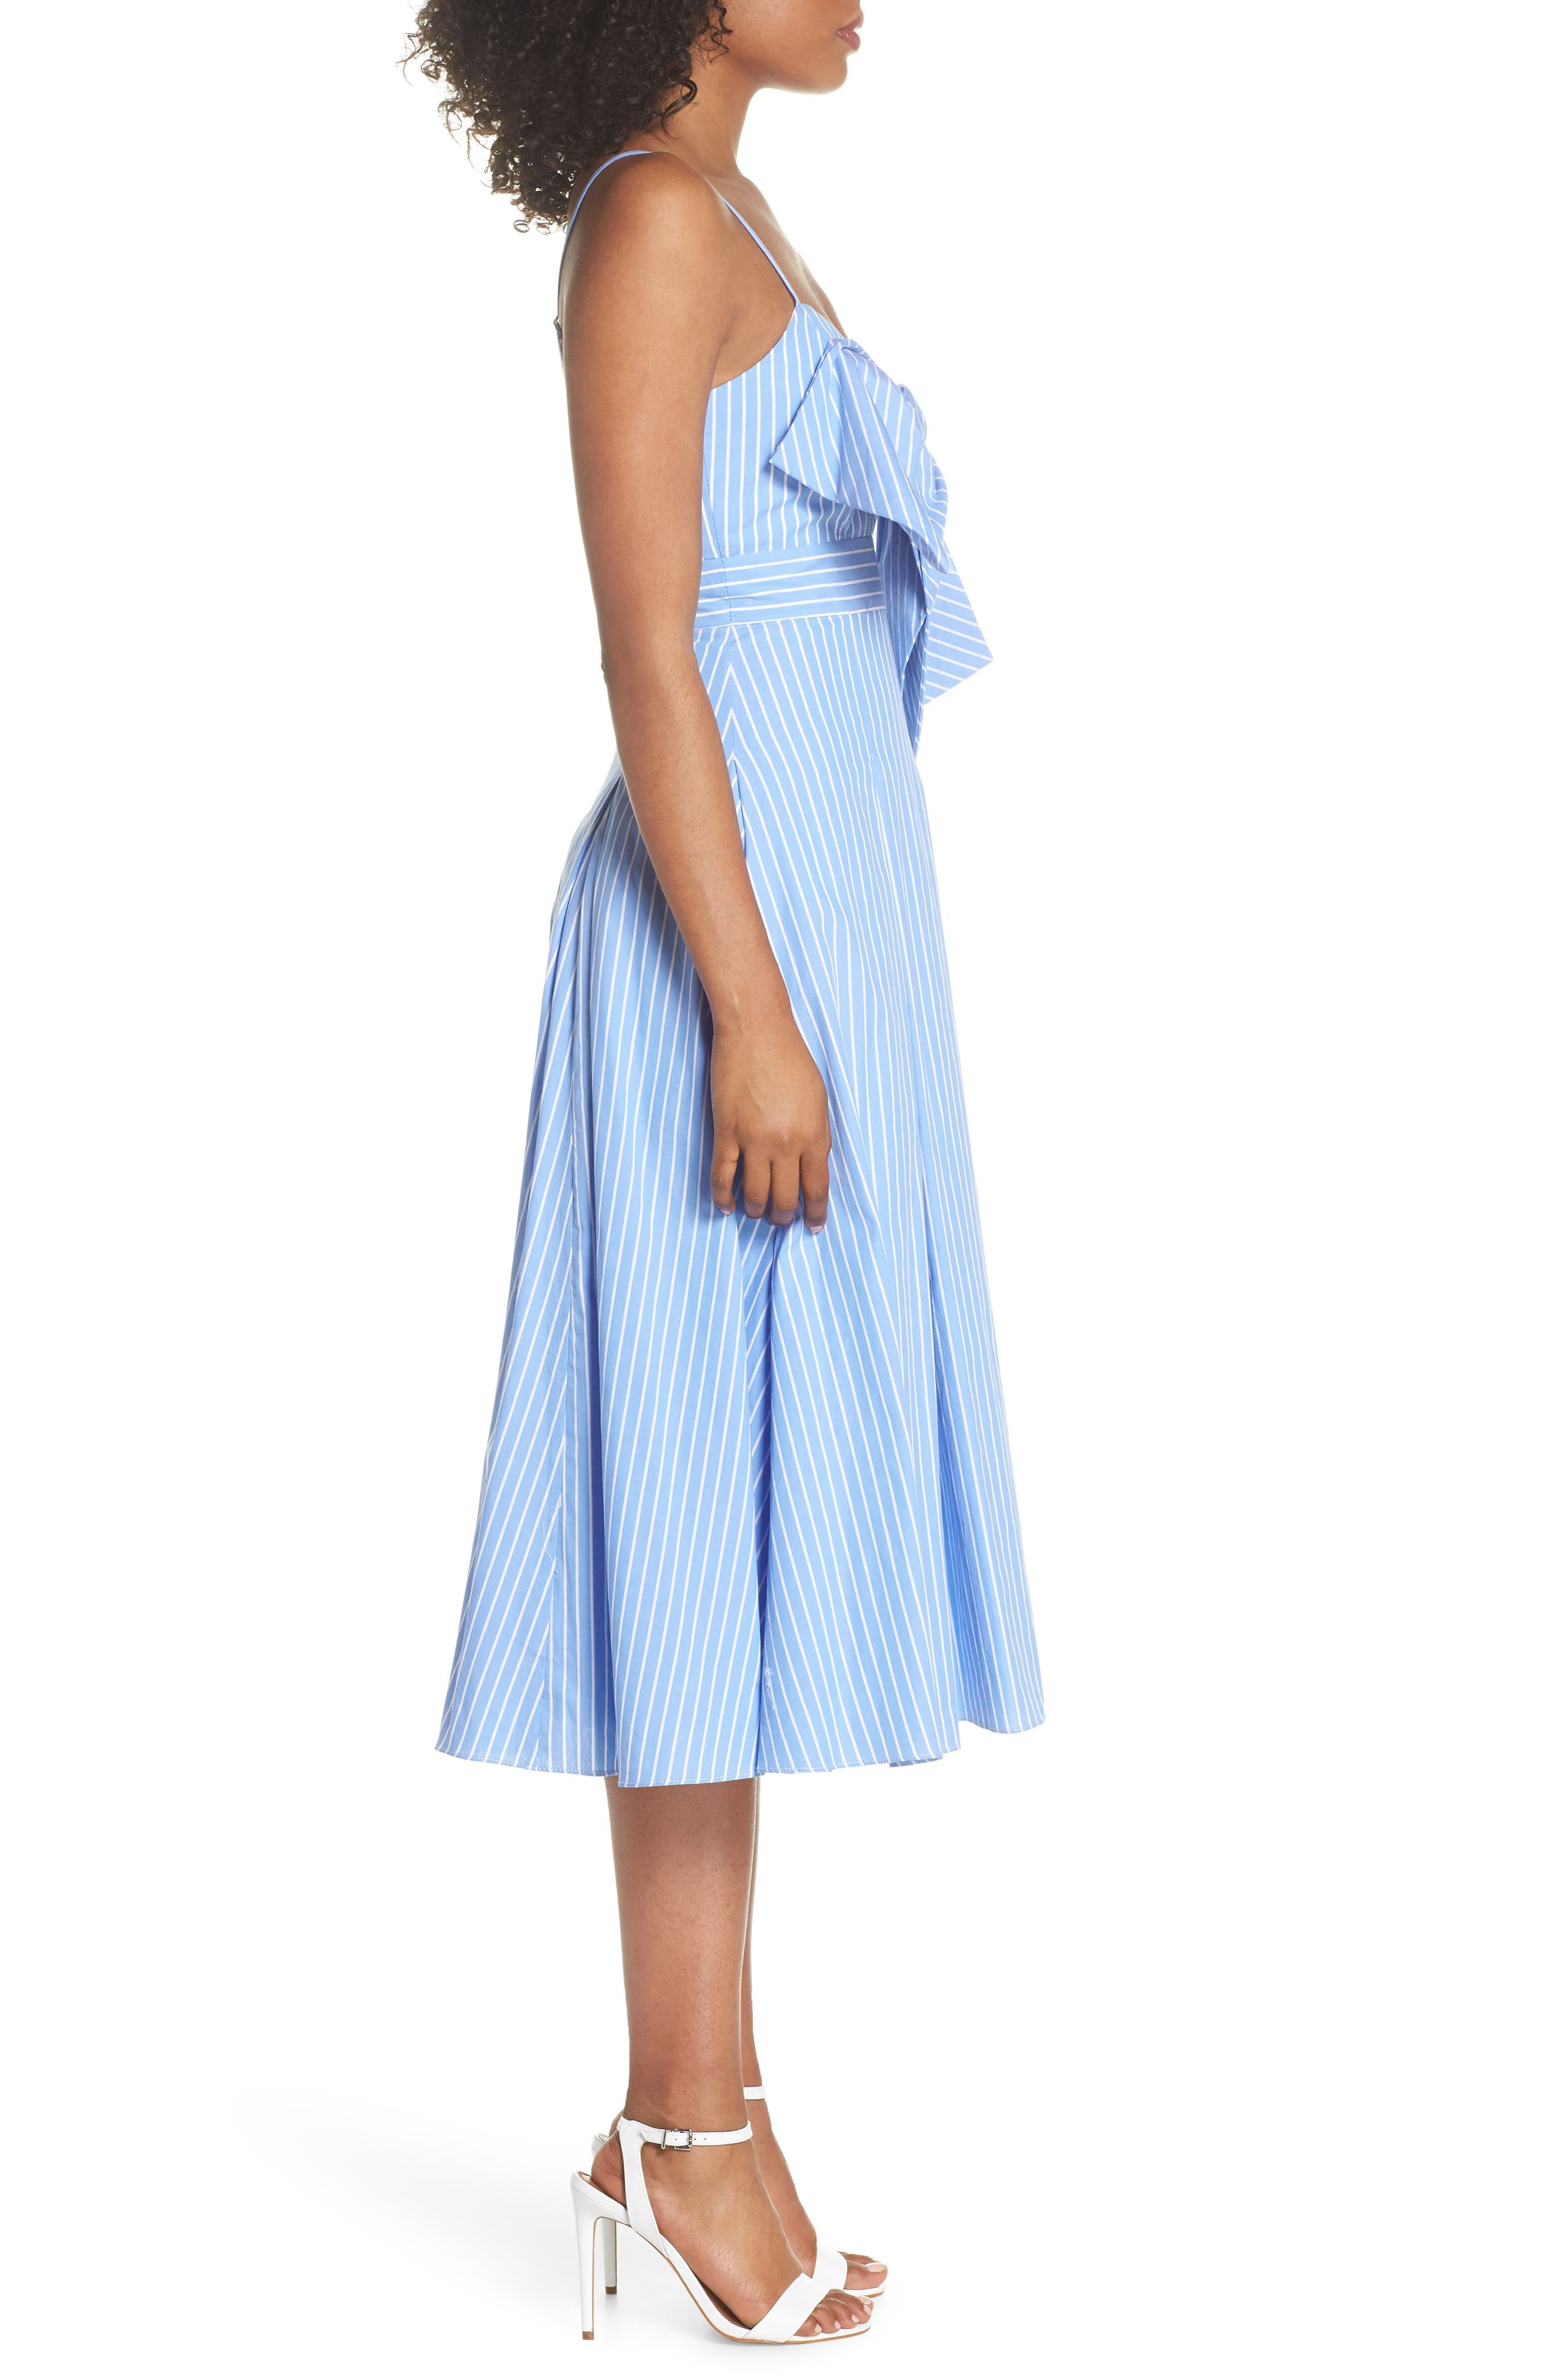 Becky Bow Front Tea Length Dress,                             Alternate thumbnail 3, color,                             450